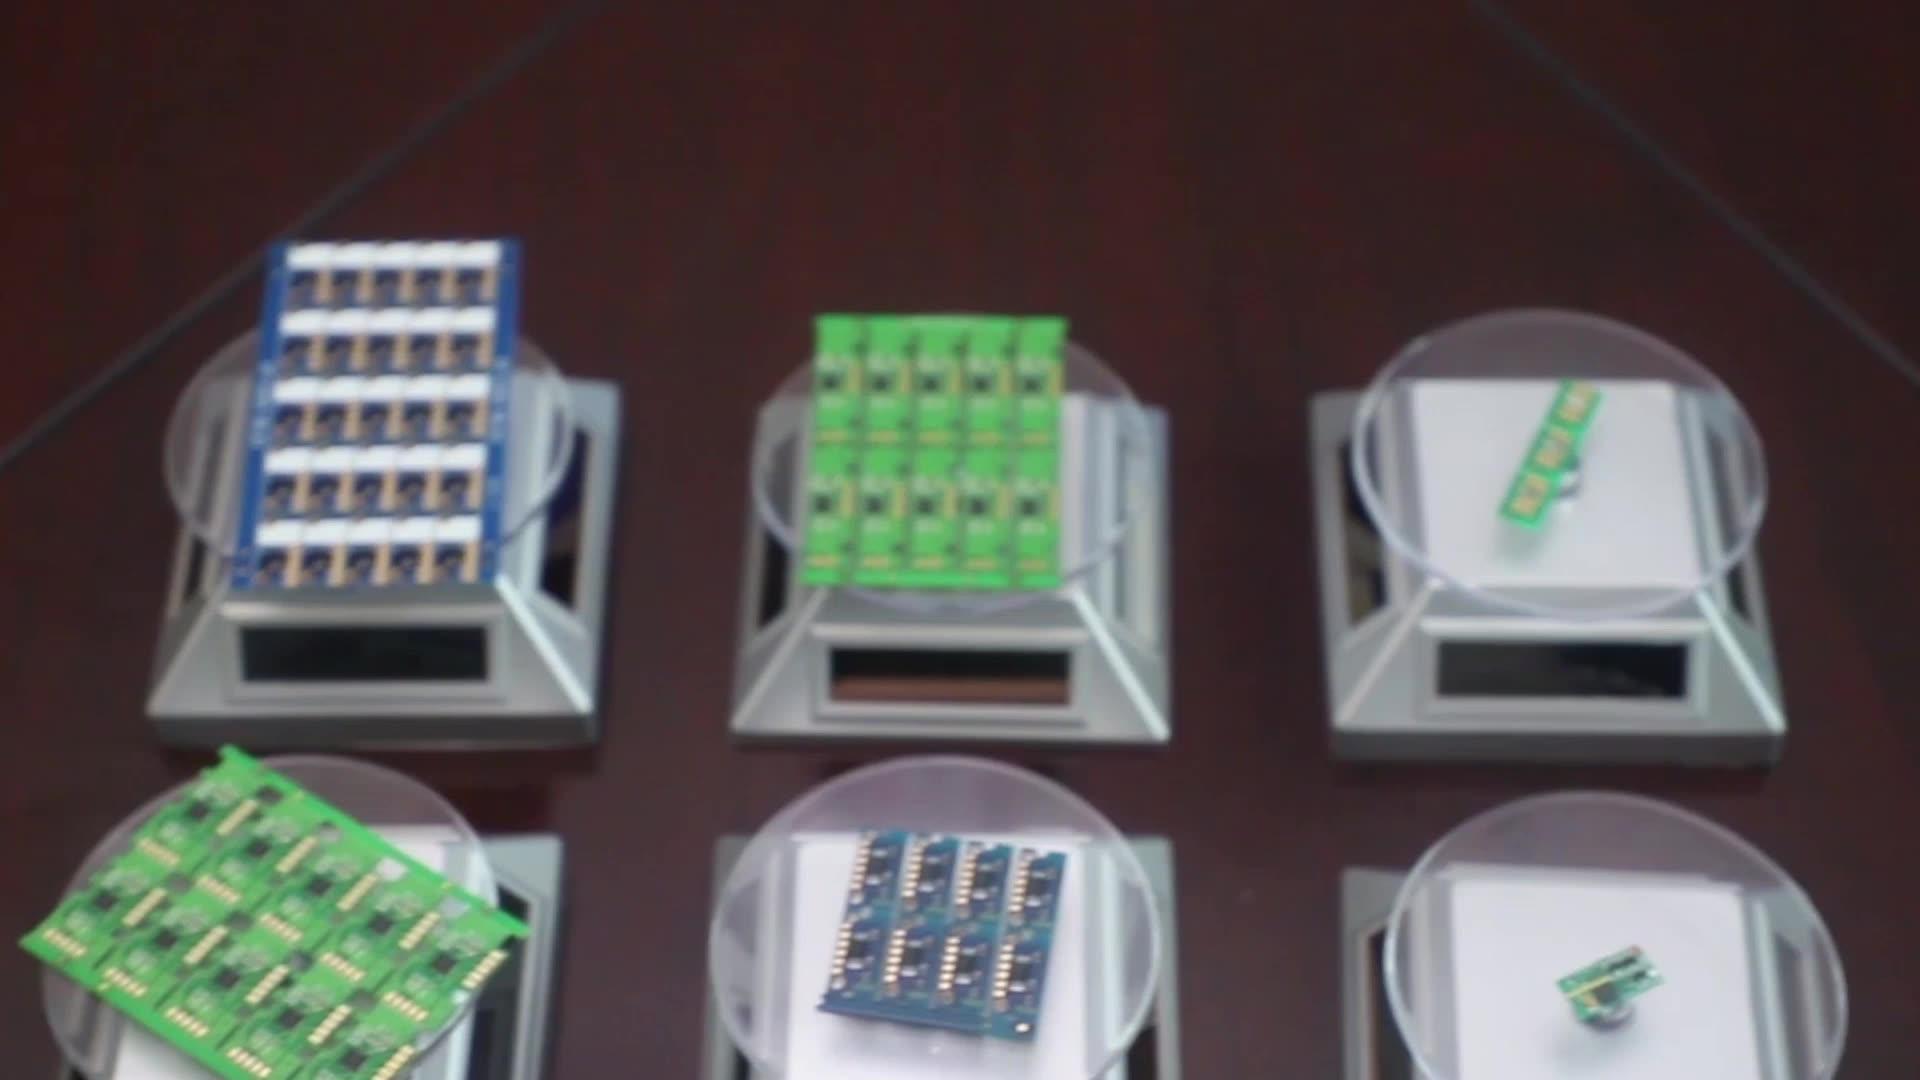 EU Toner Cartridge Chip for Sharps AR-5618 5620 5623 MX-182 M202 M232 chip resetter for MX-235 MX-236GT